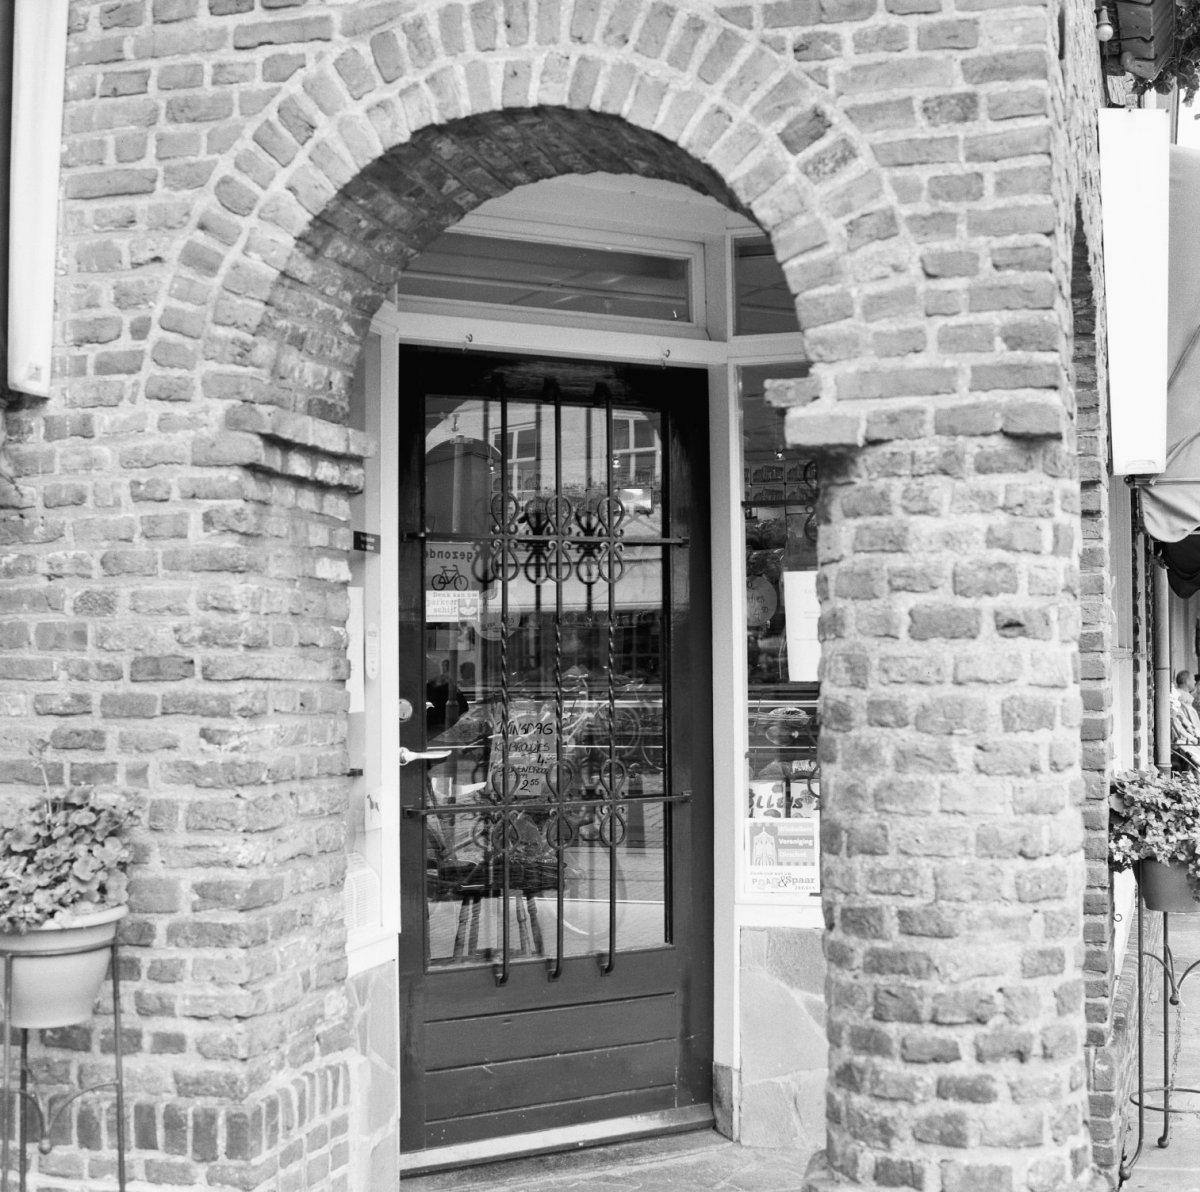 Huis 39 de reizende man 39 met trapgevel in oirschot monument - Huis ingang ...